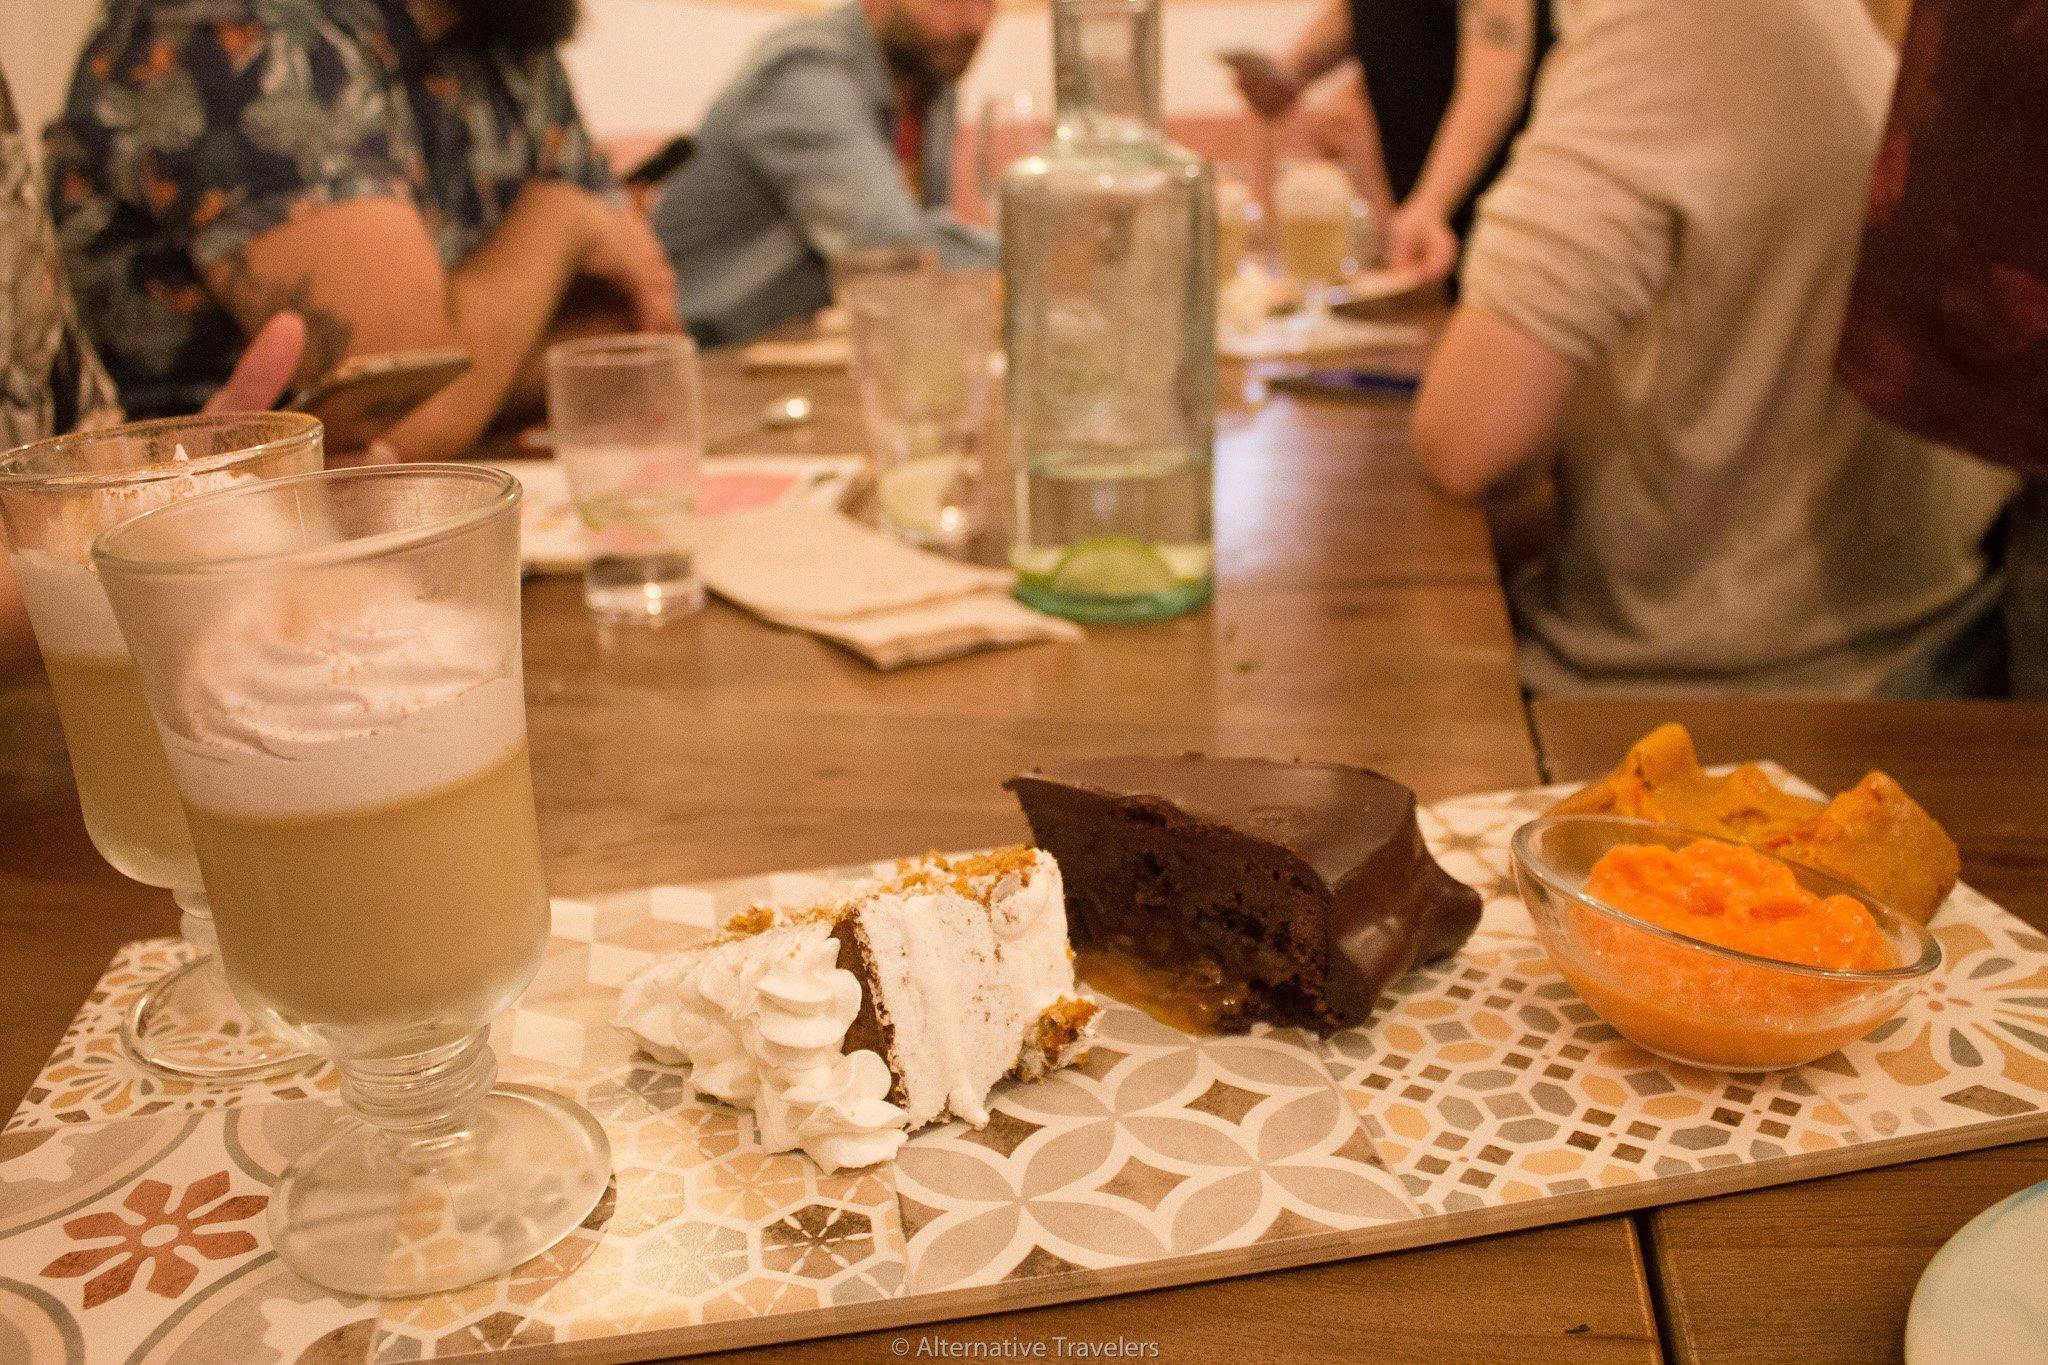 La Tia Carlota desserts | AlternativeTravelers.com